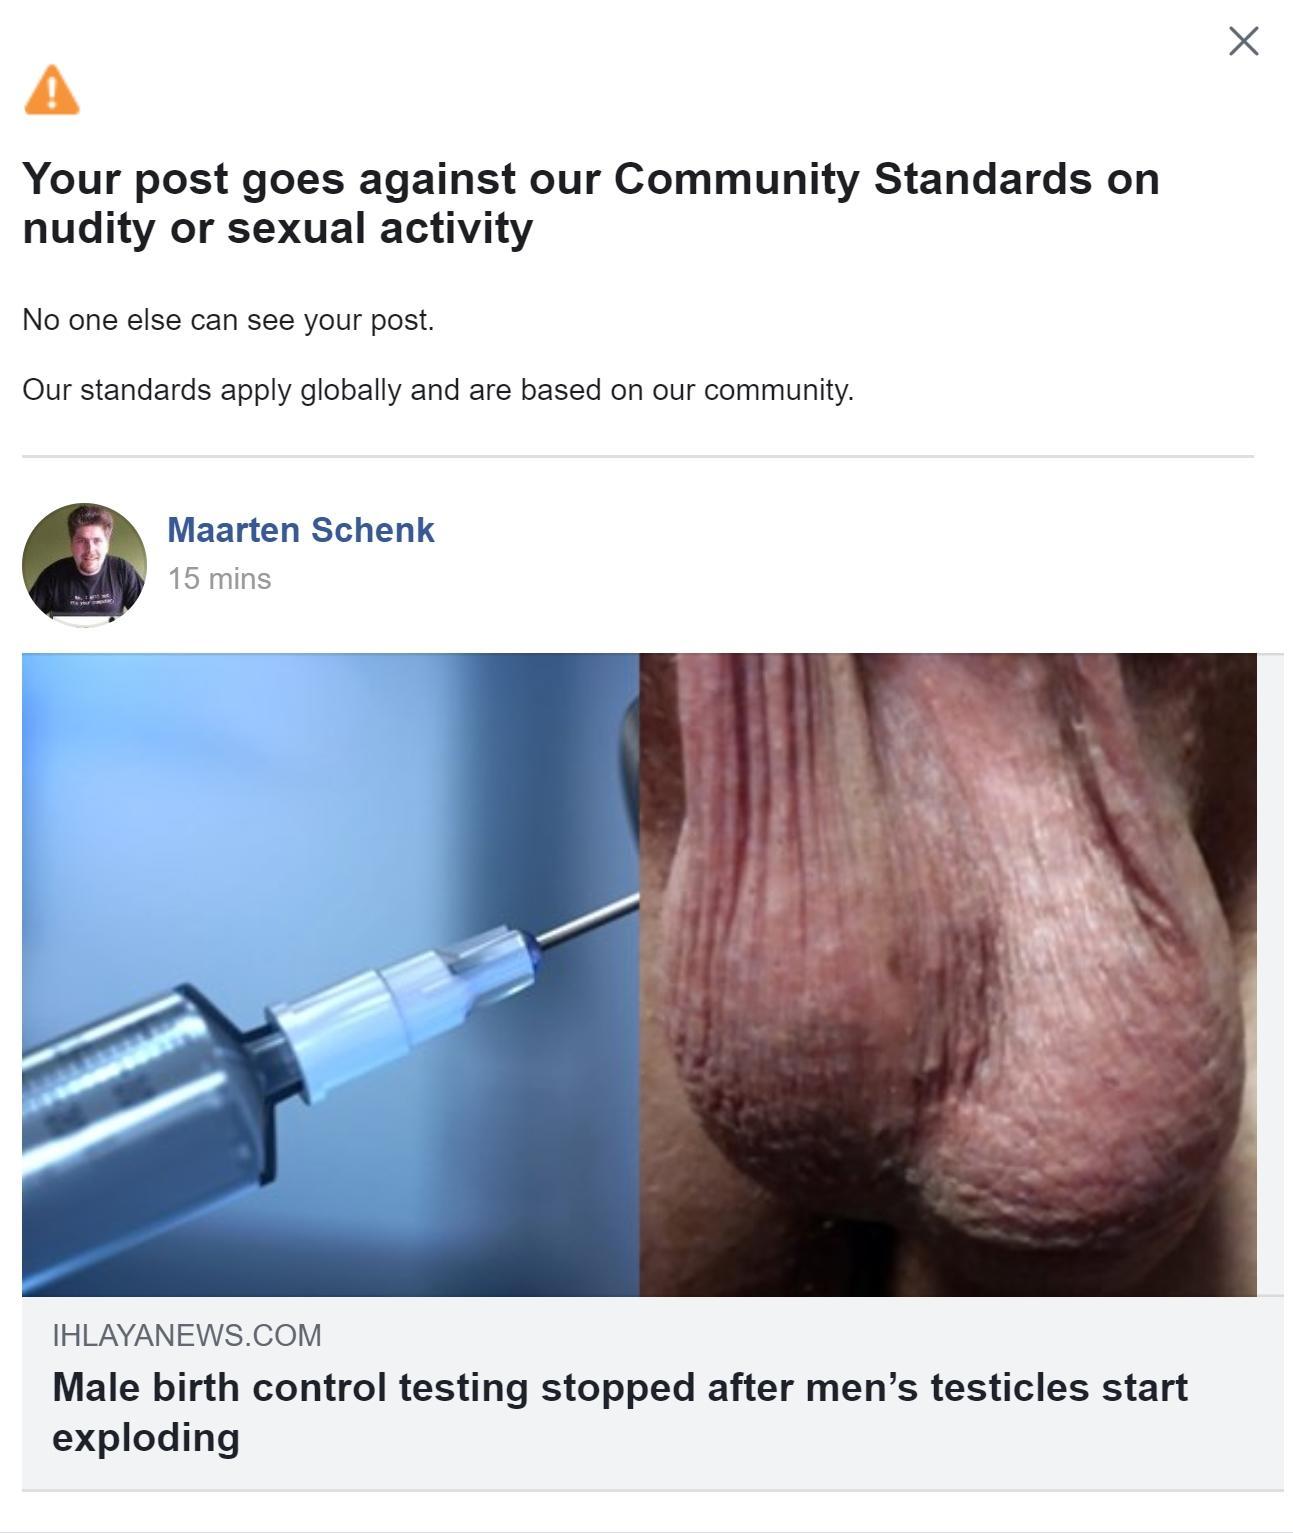 communitystandards.jpg